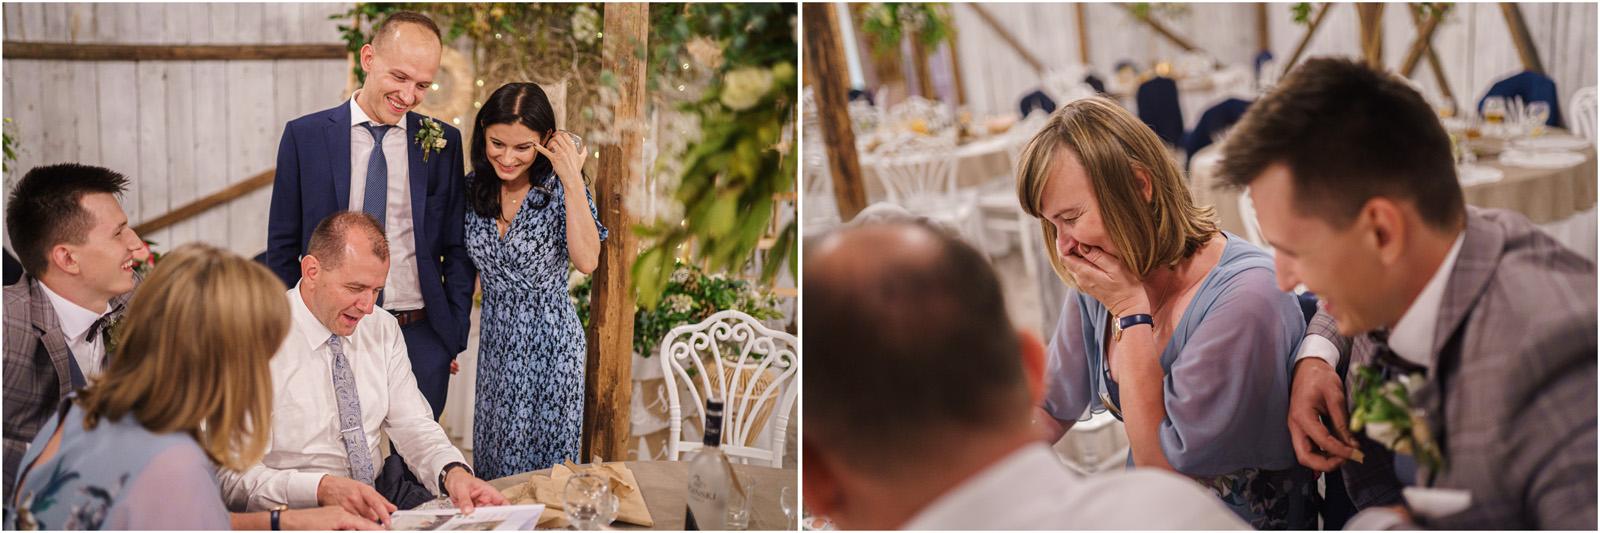 Ania & Mateusz | boho wesele w Stodole pod Kasztanami 141